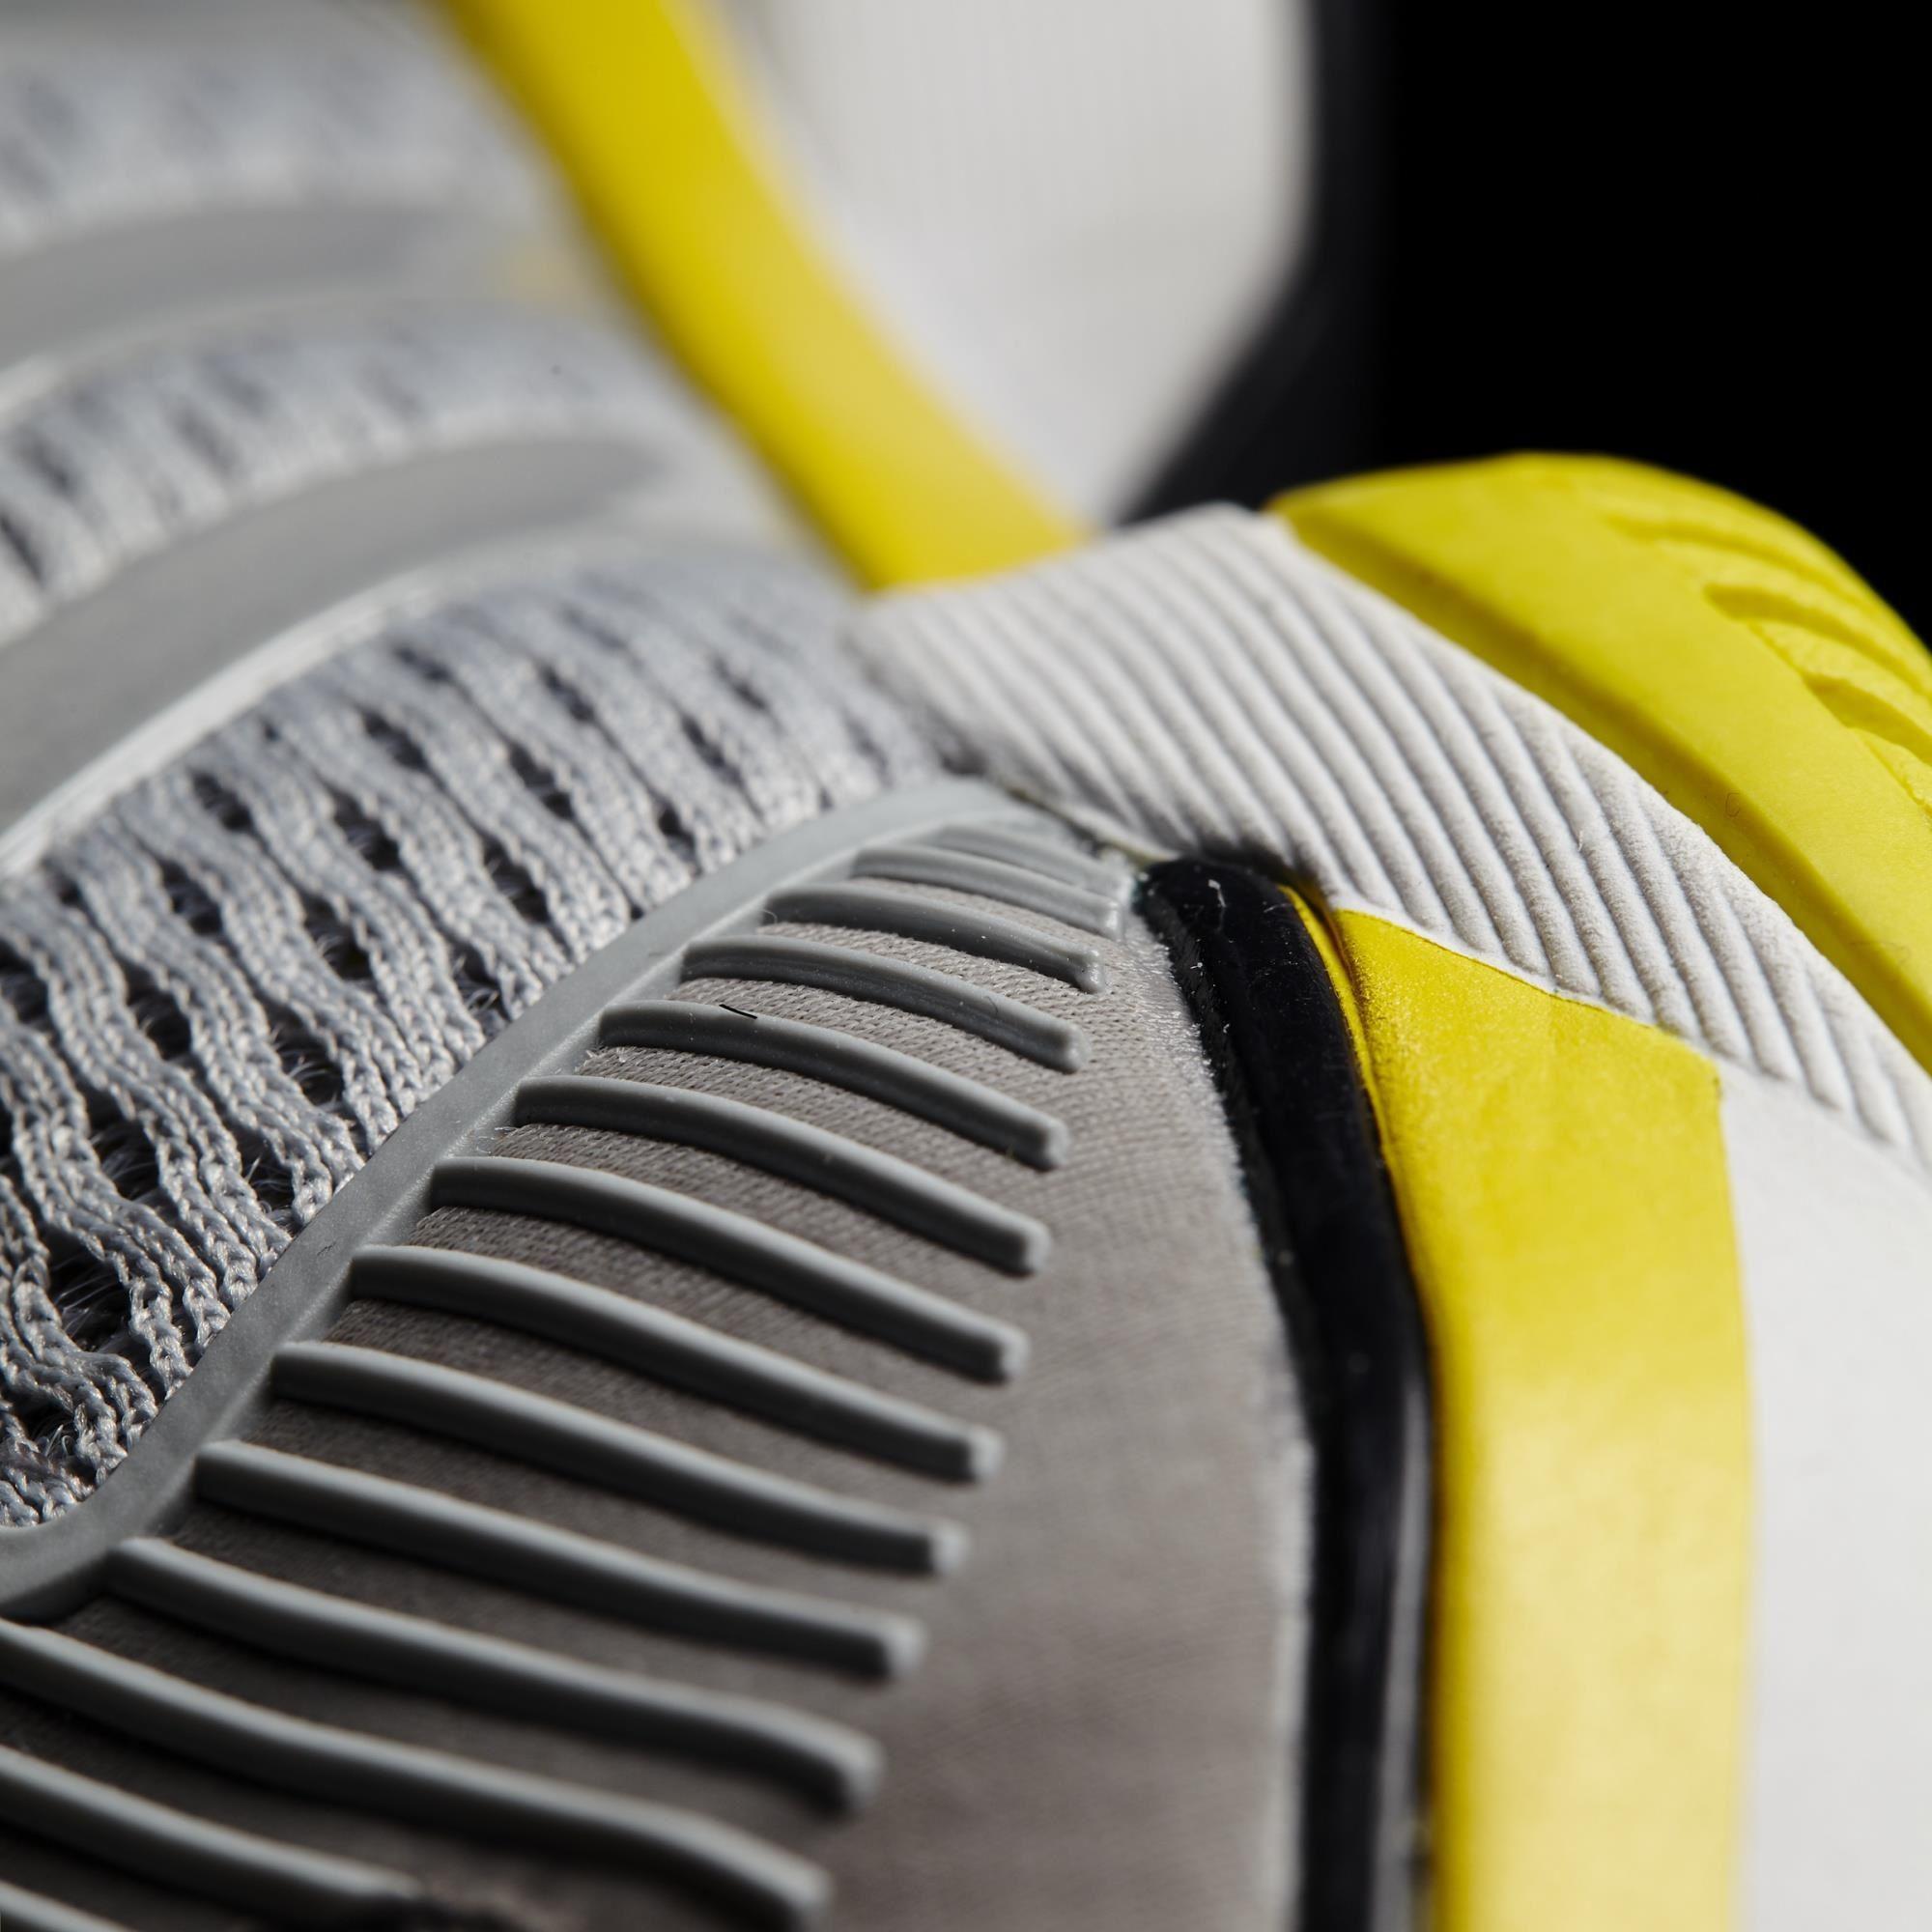 Adidas Stella Barricada 2015 Grises Zapatos De Las Mujeres CyYZB7Db